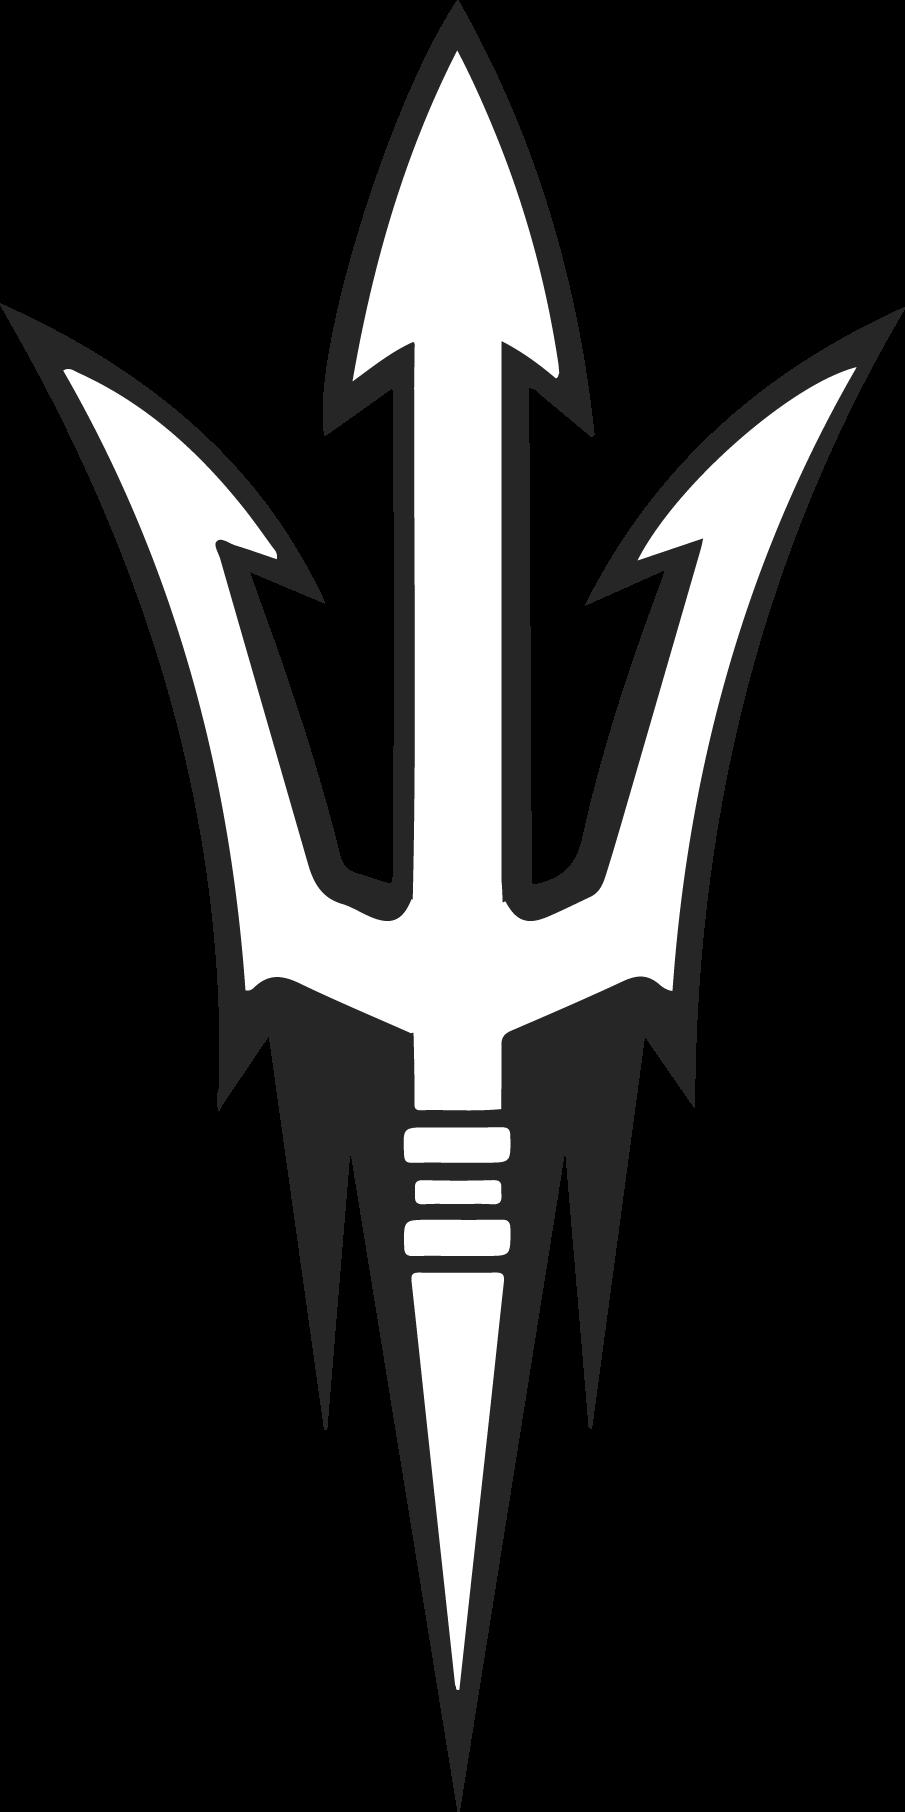 Logos . Trident clipart devil pitchfork